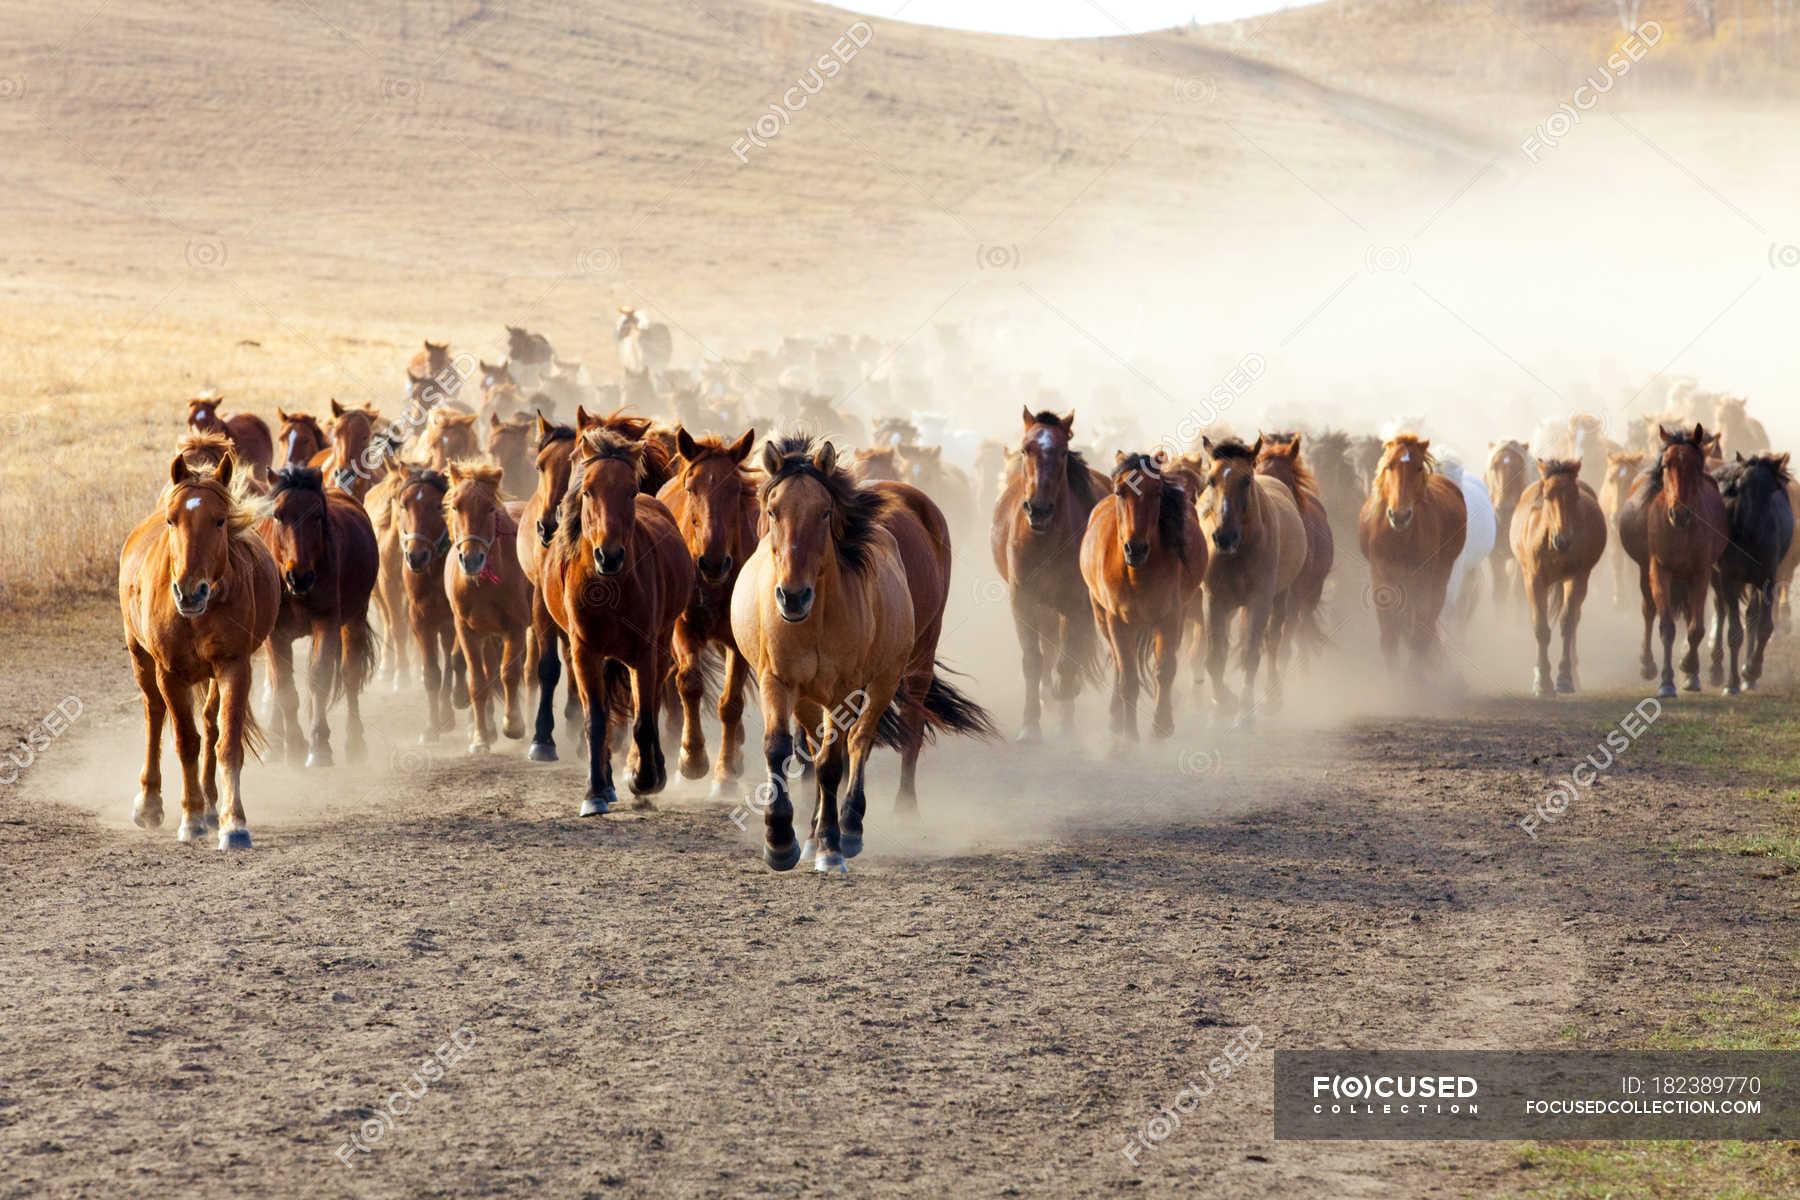 Herd Of Wild Horses Running In Inner Mongolia Grassland Copy Space Horizontal Stock Photo 182389770